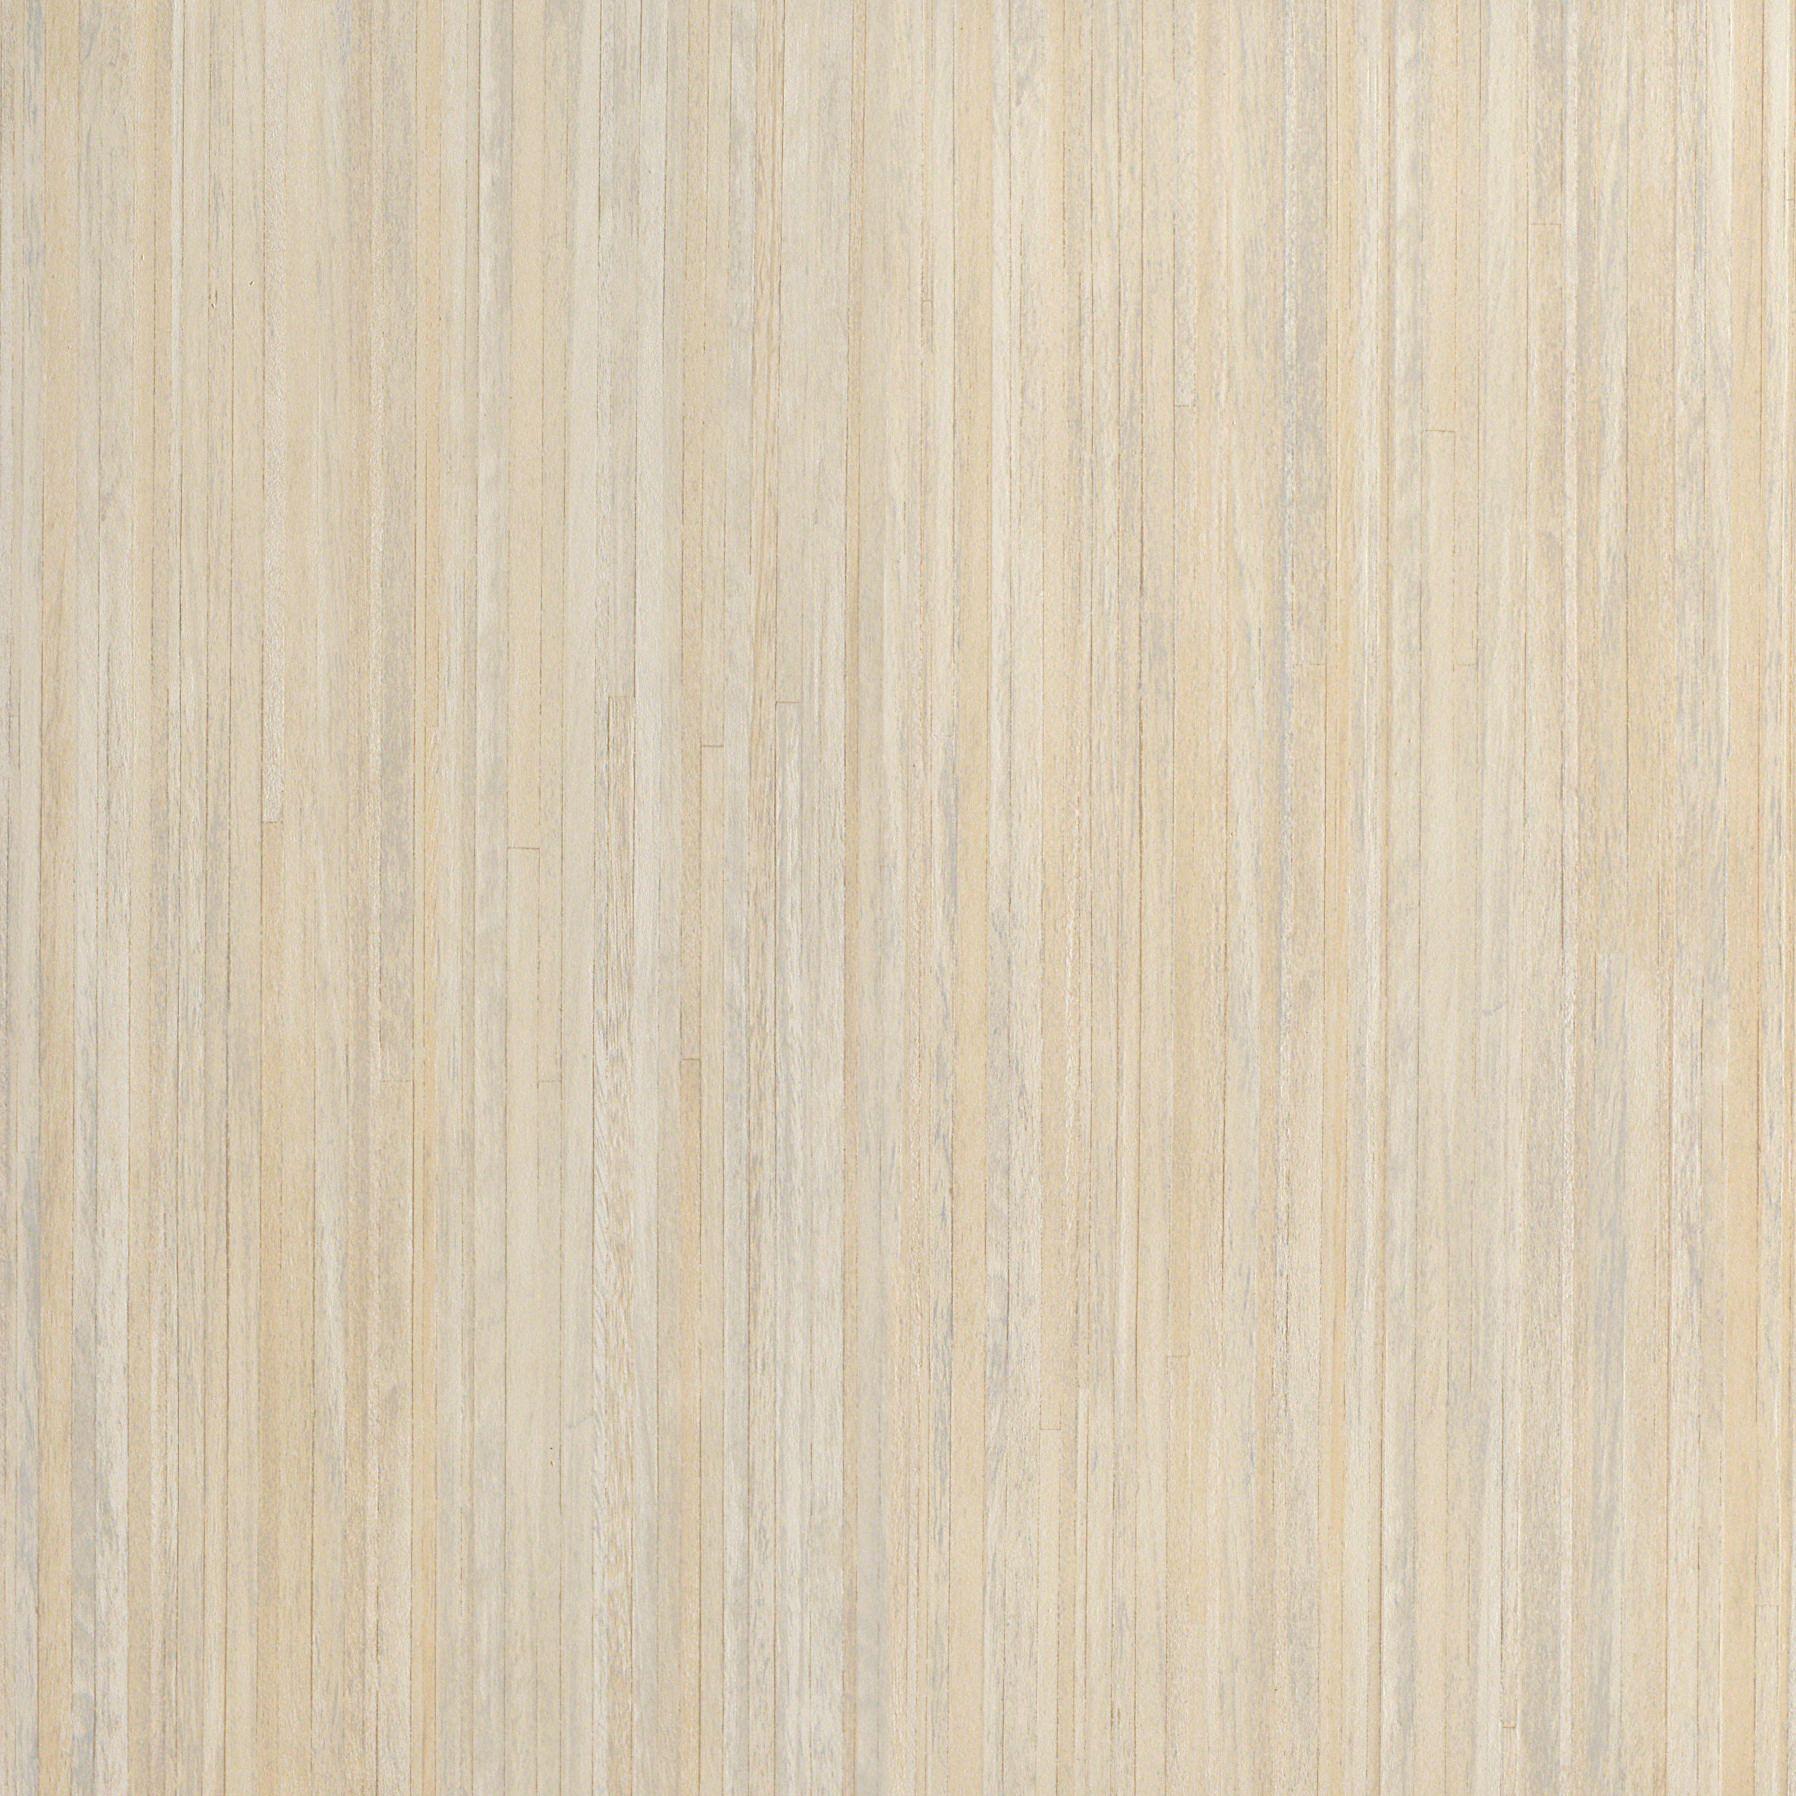 Bamboo Field Tile Architectural Ceramics Kitchen